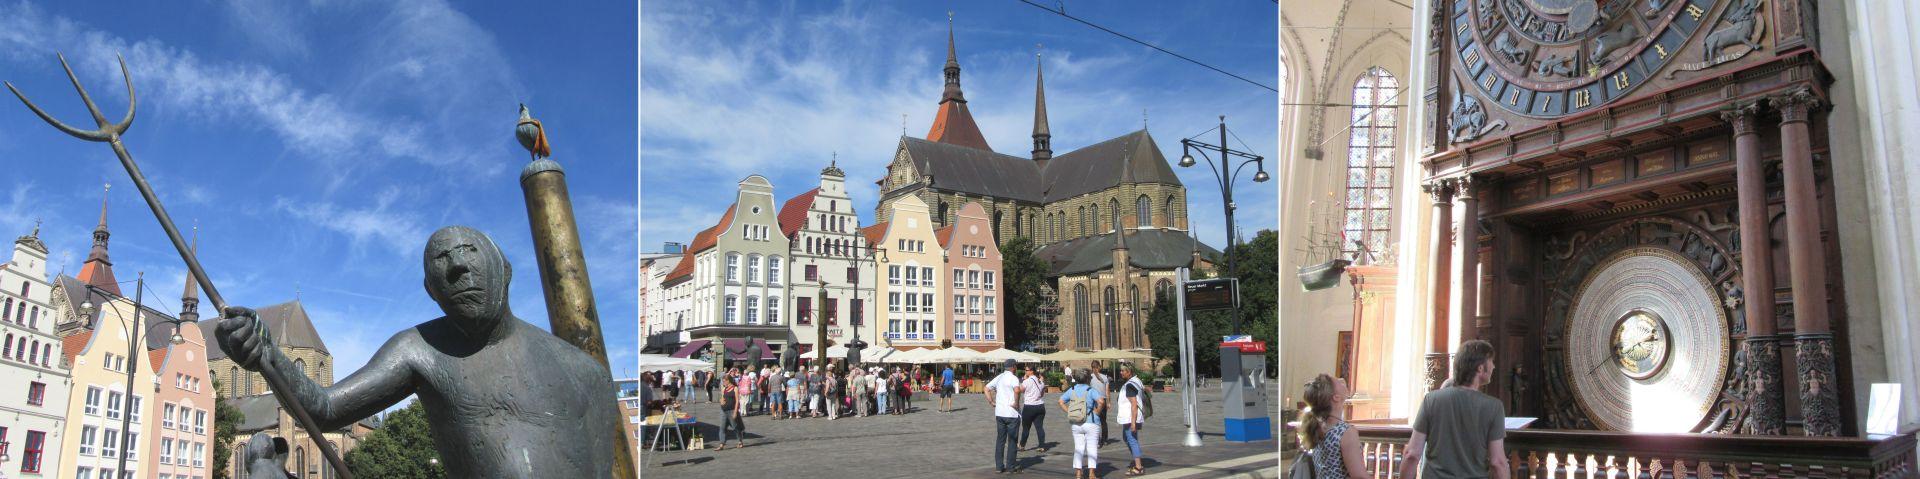 ost16-b270-platz-marienkirche